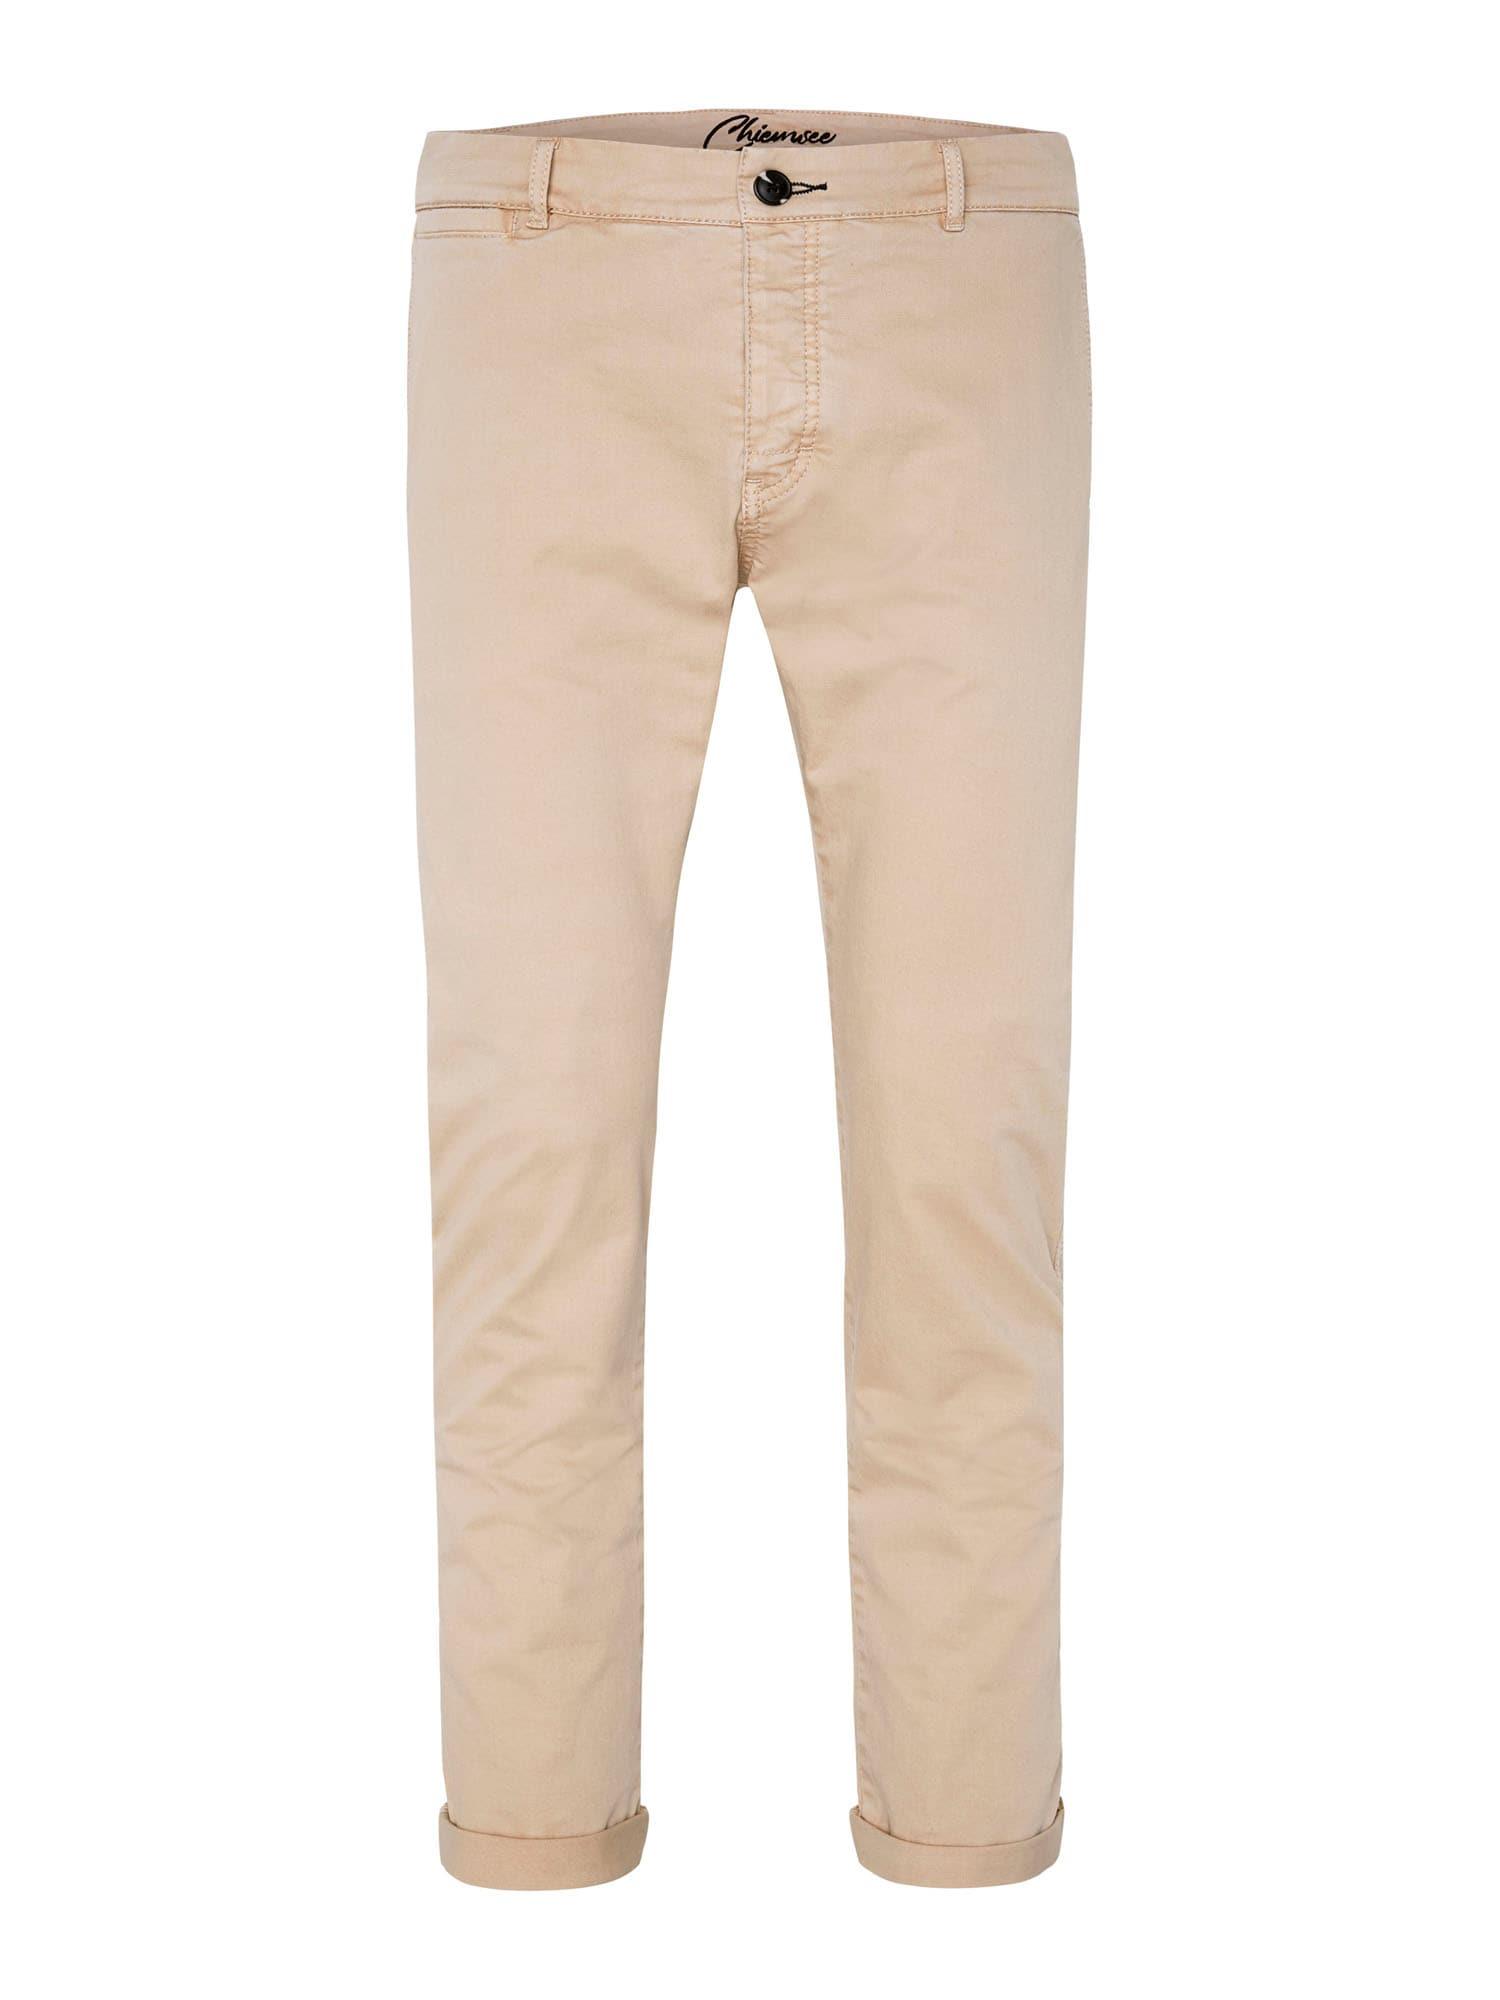 CHIEMSEE Outdoorové kalhoty  béžová